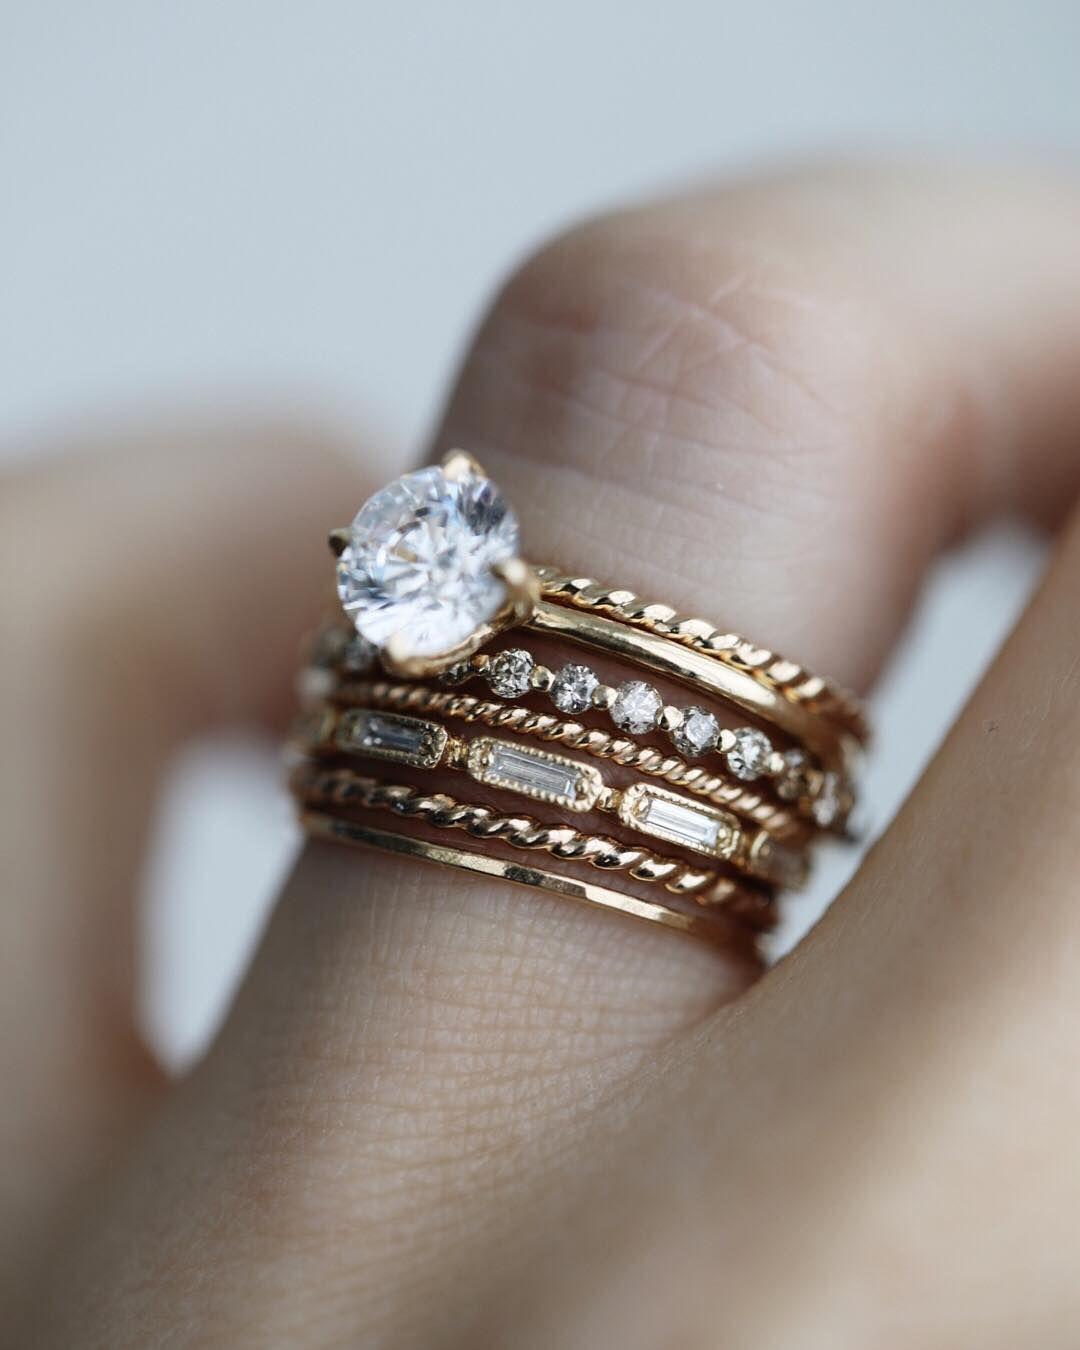 Top 10 Engagement Ring Trends For 2019 Lovely Bride Trending